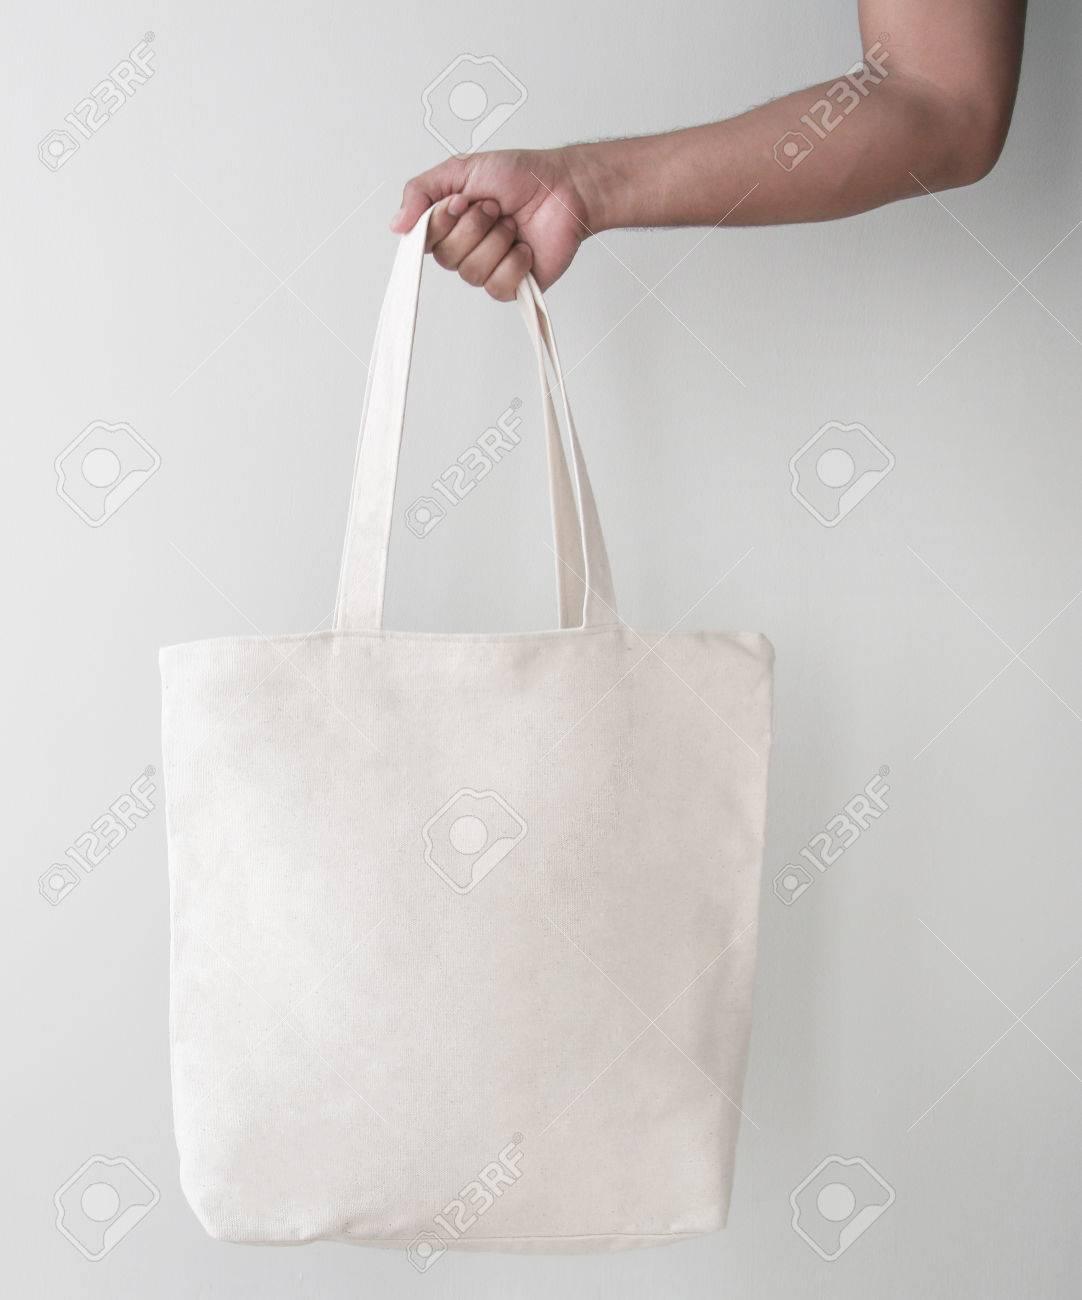 fa3b94f937c0 Blank canvas tote bag, design mockup with hand. Handmade shopping bags.  Stock Photo